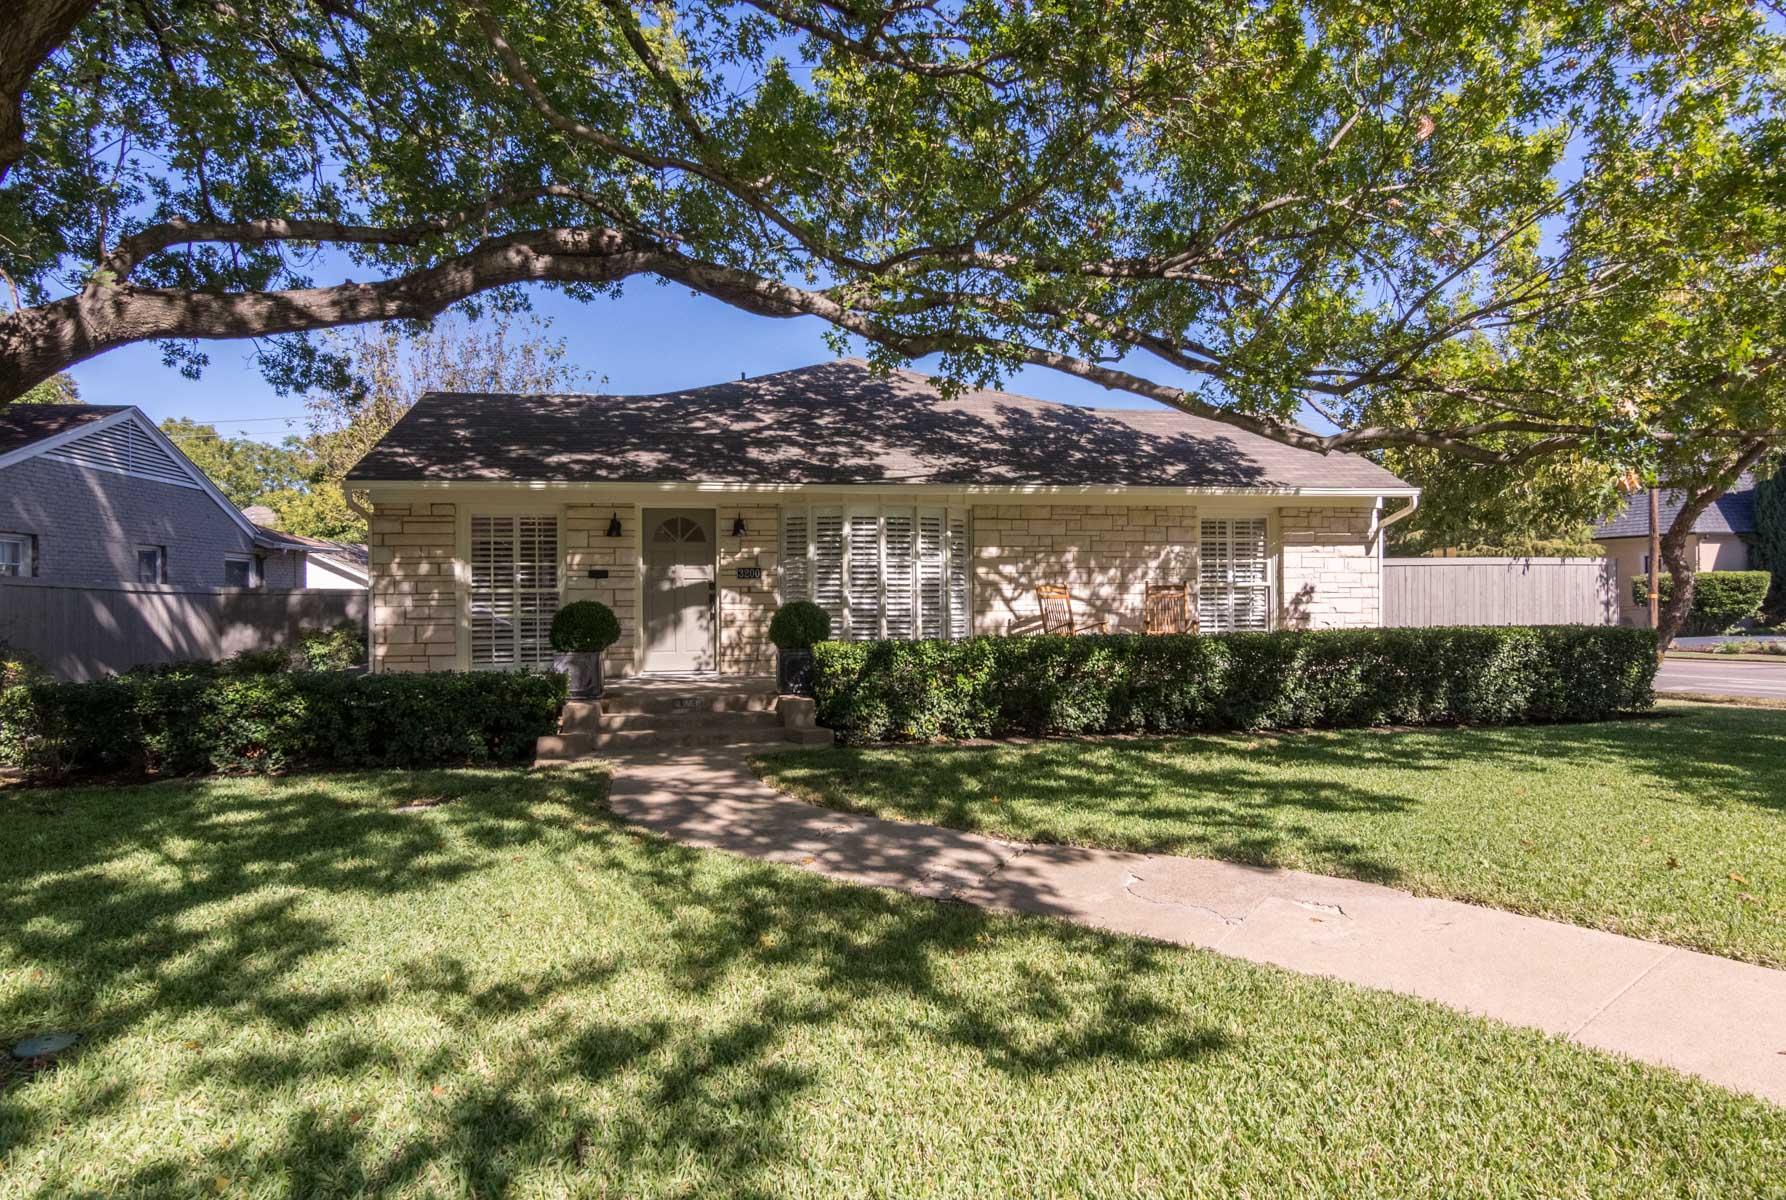 Casa para uma família para Venda às 3200 Lovers Ln, Dallas Dallas, Texas, 75225 Estados Unidos